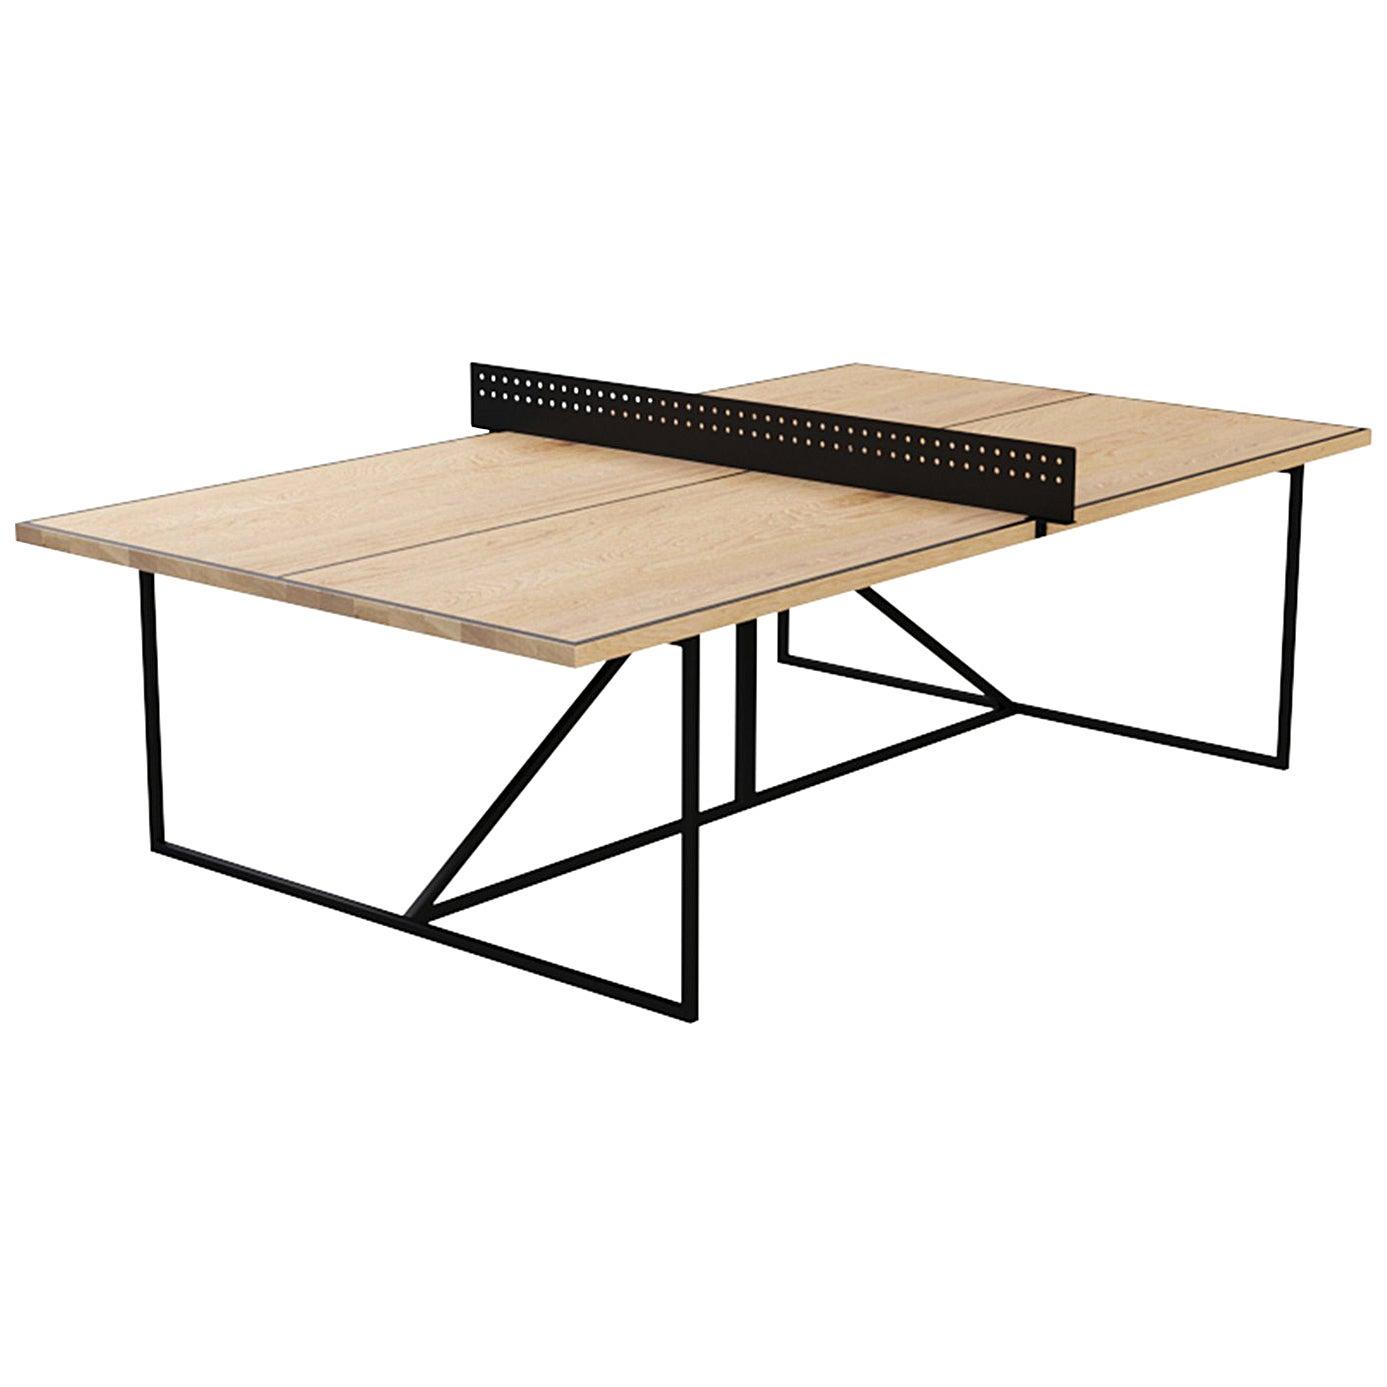 "Customizable Modern ""The Break"" Ping Pong Table"